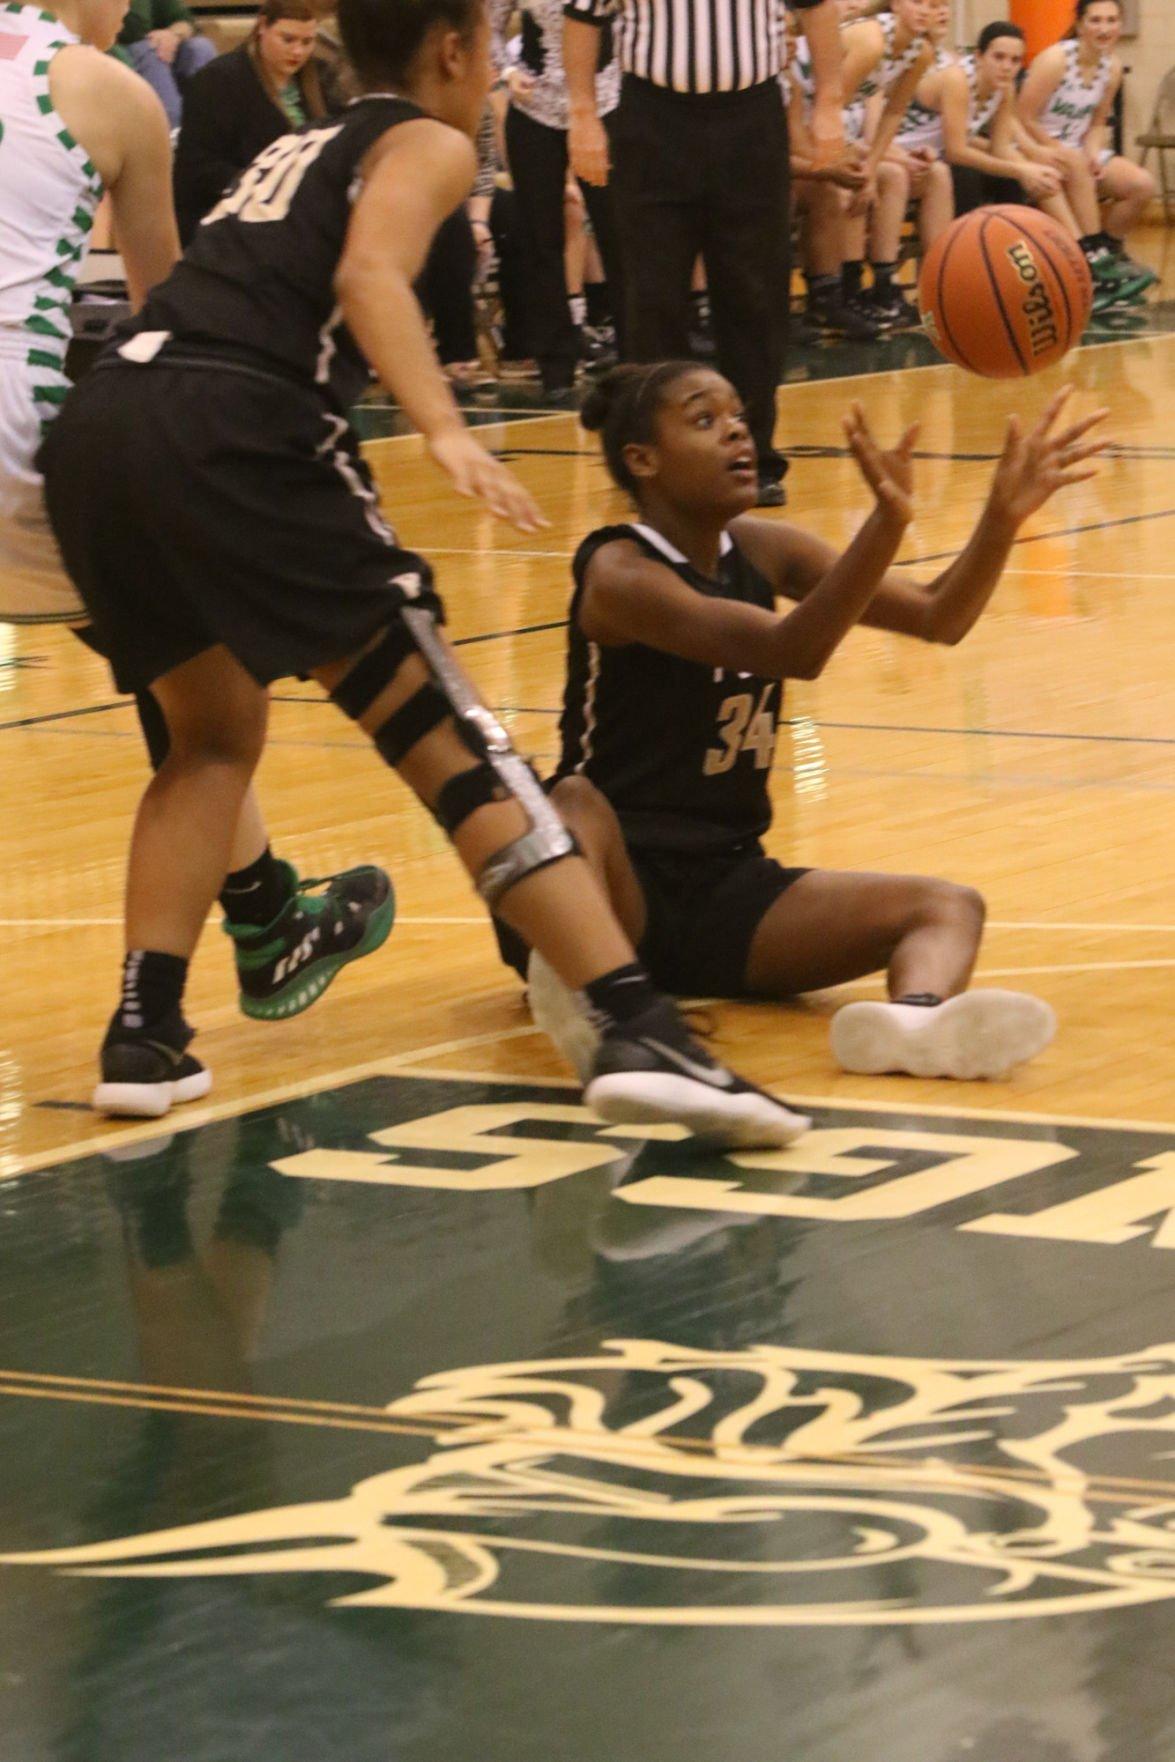 Gallery: Penn at Valparaiso girls basketball